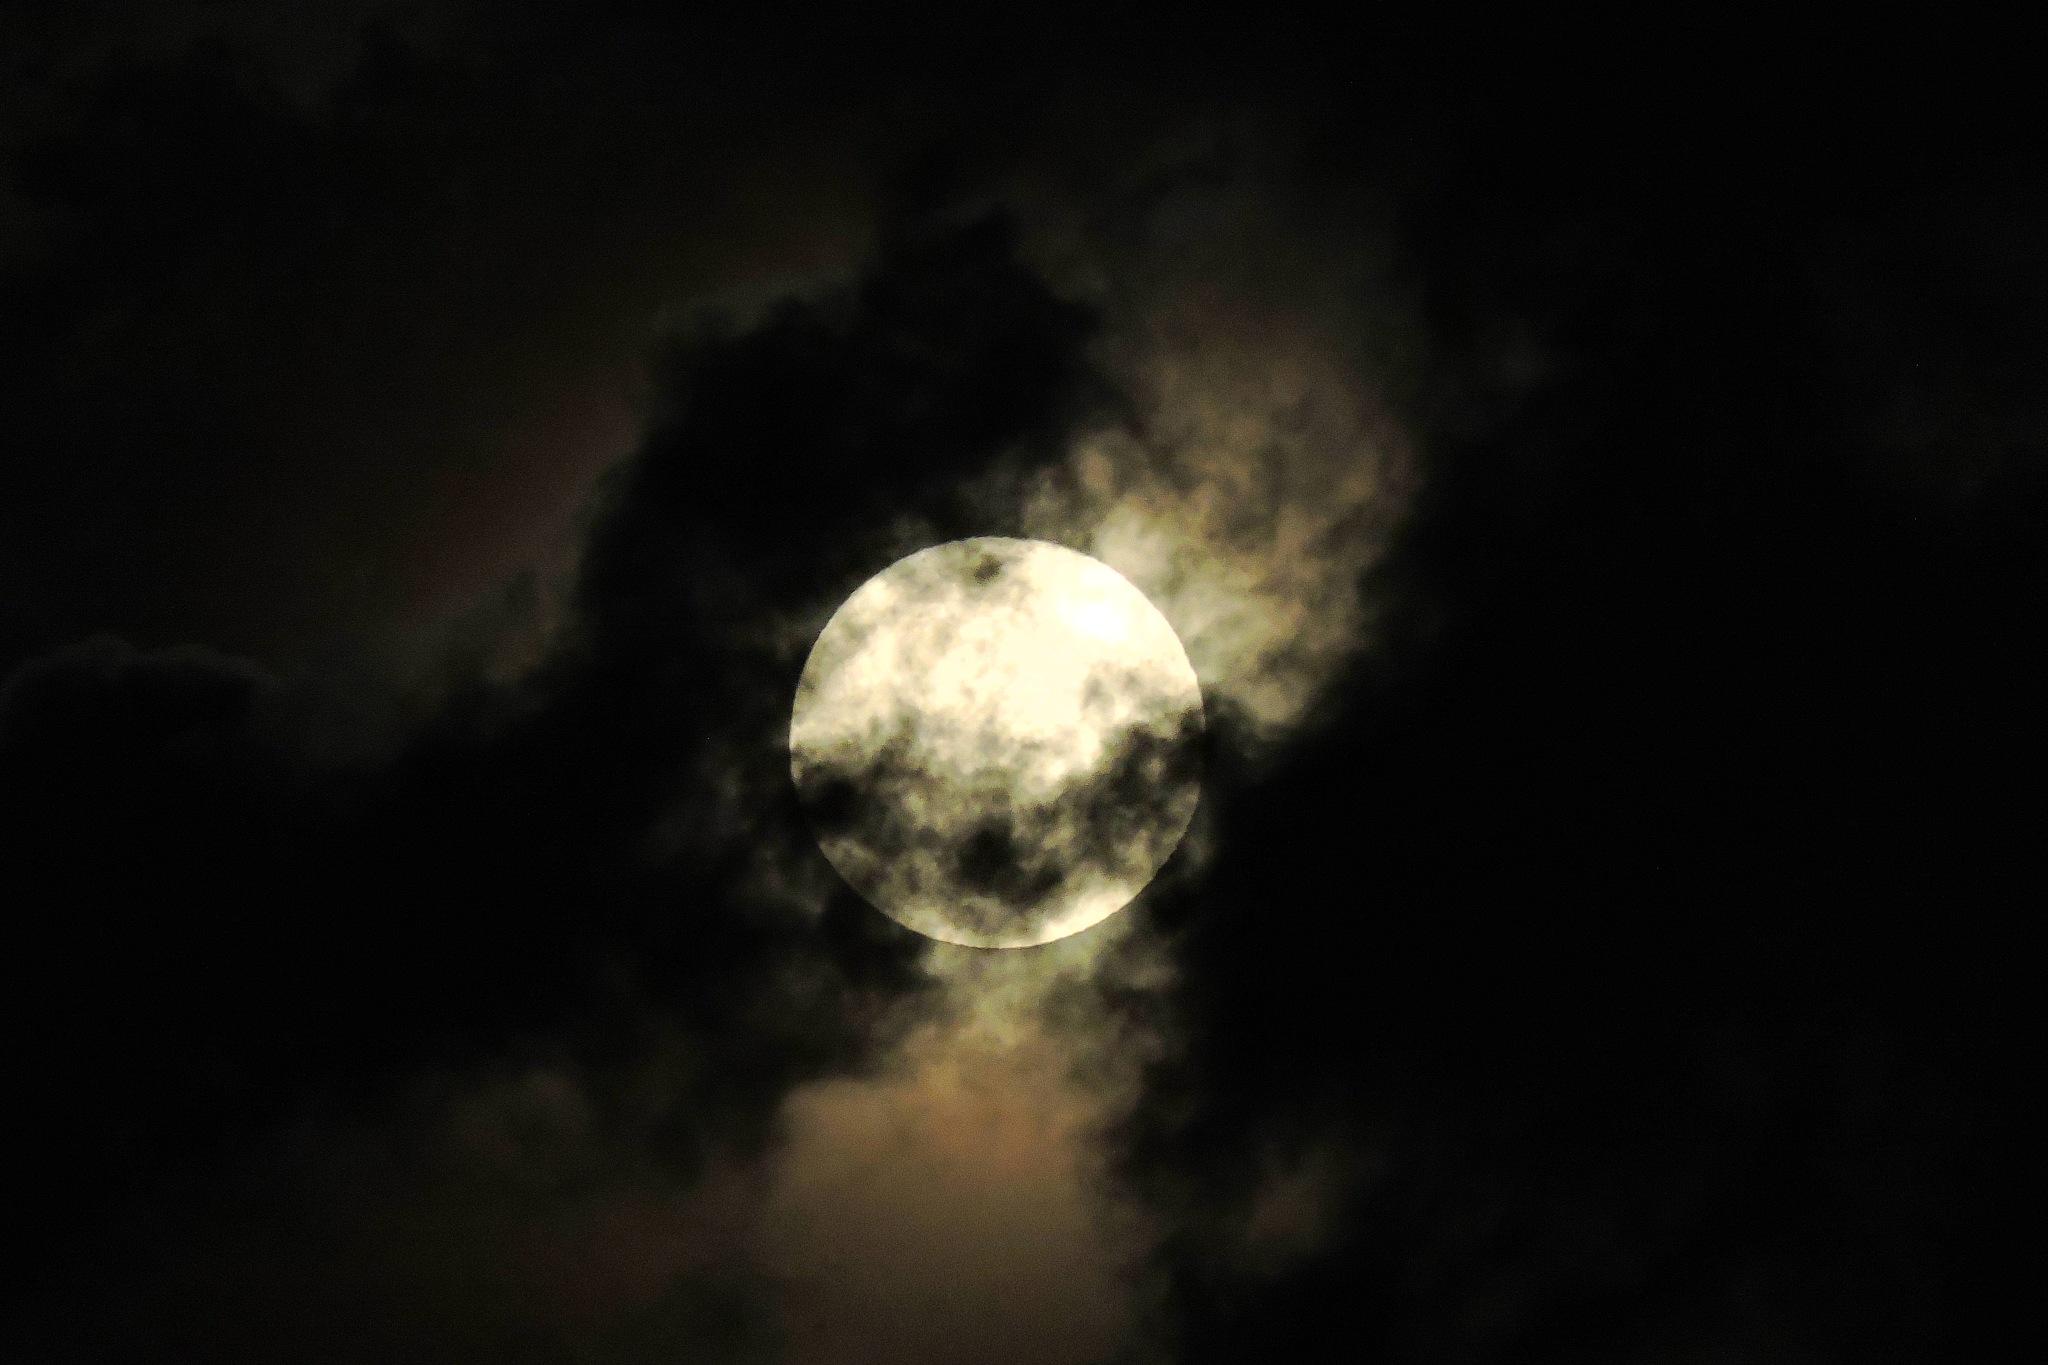 Harvest moon by G. A. McComas